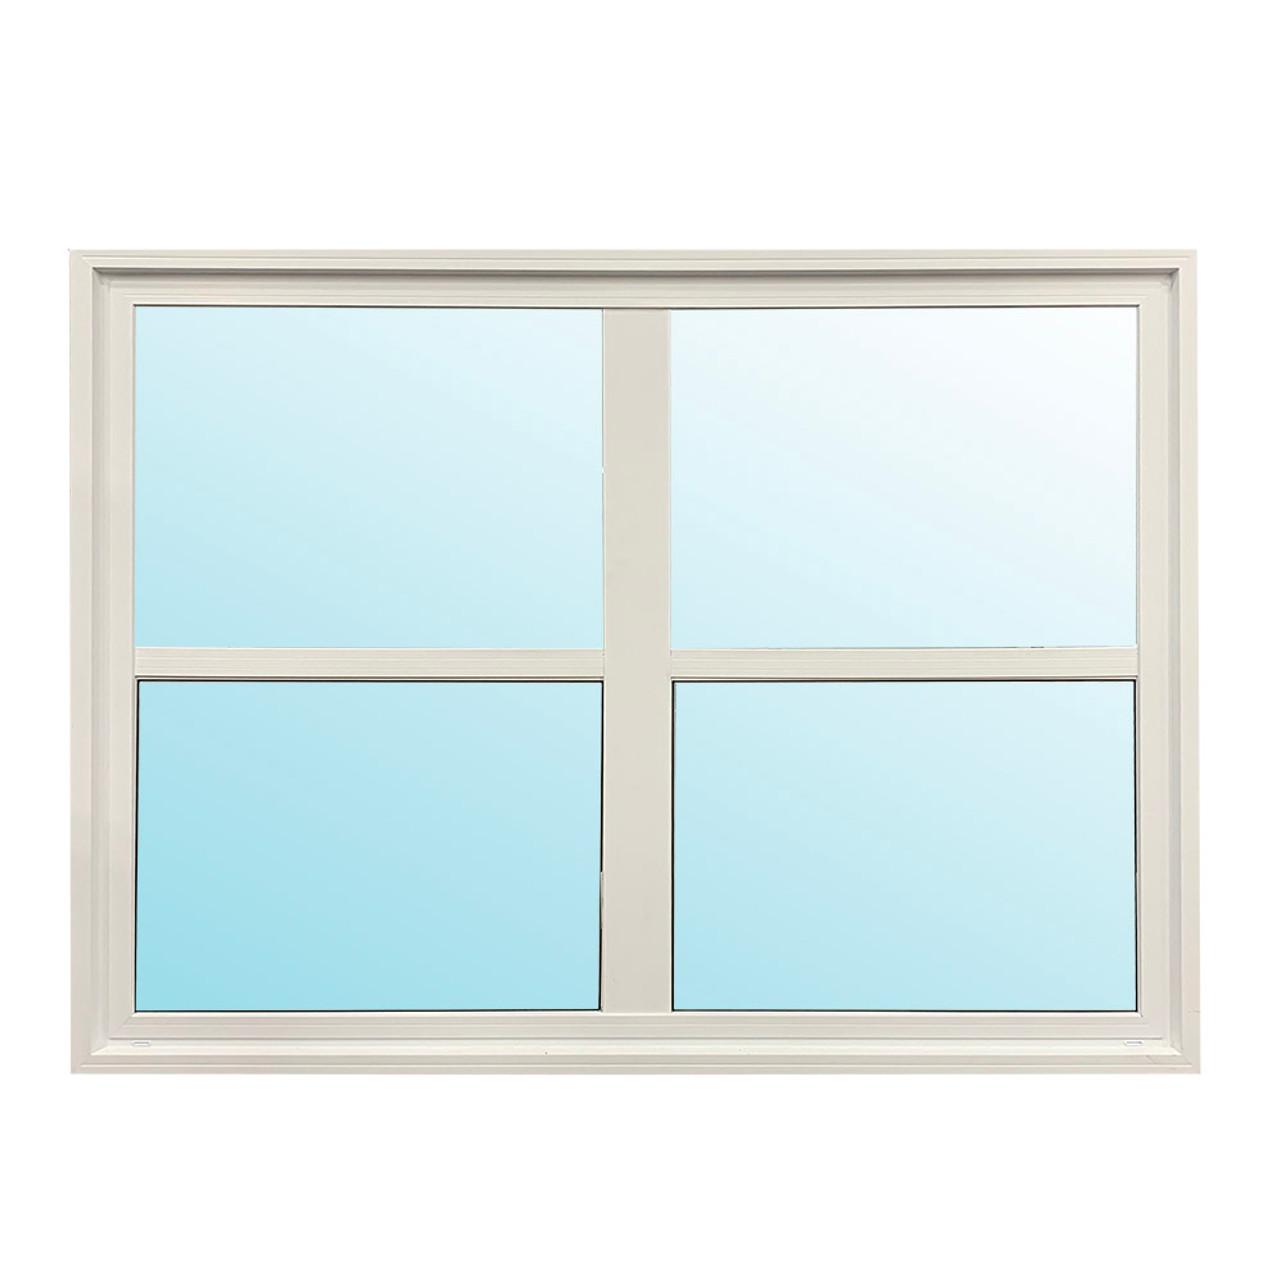 "Castlegard | 60"" x 54"" Single Hung Window | LEA"